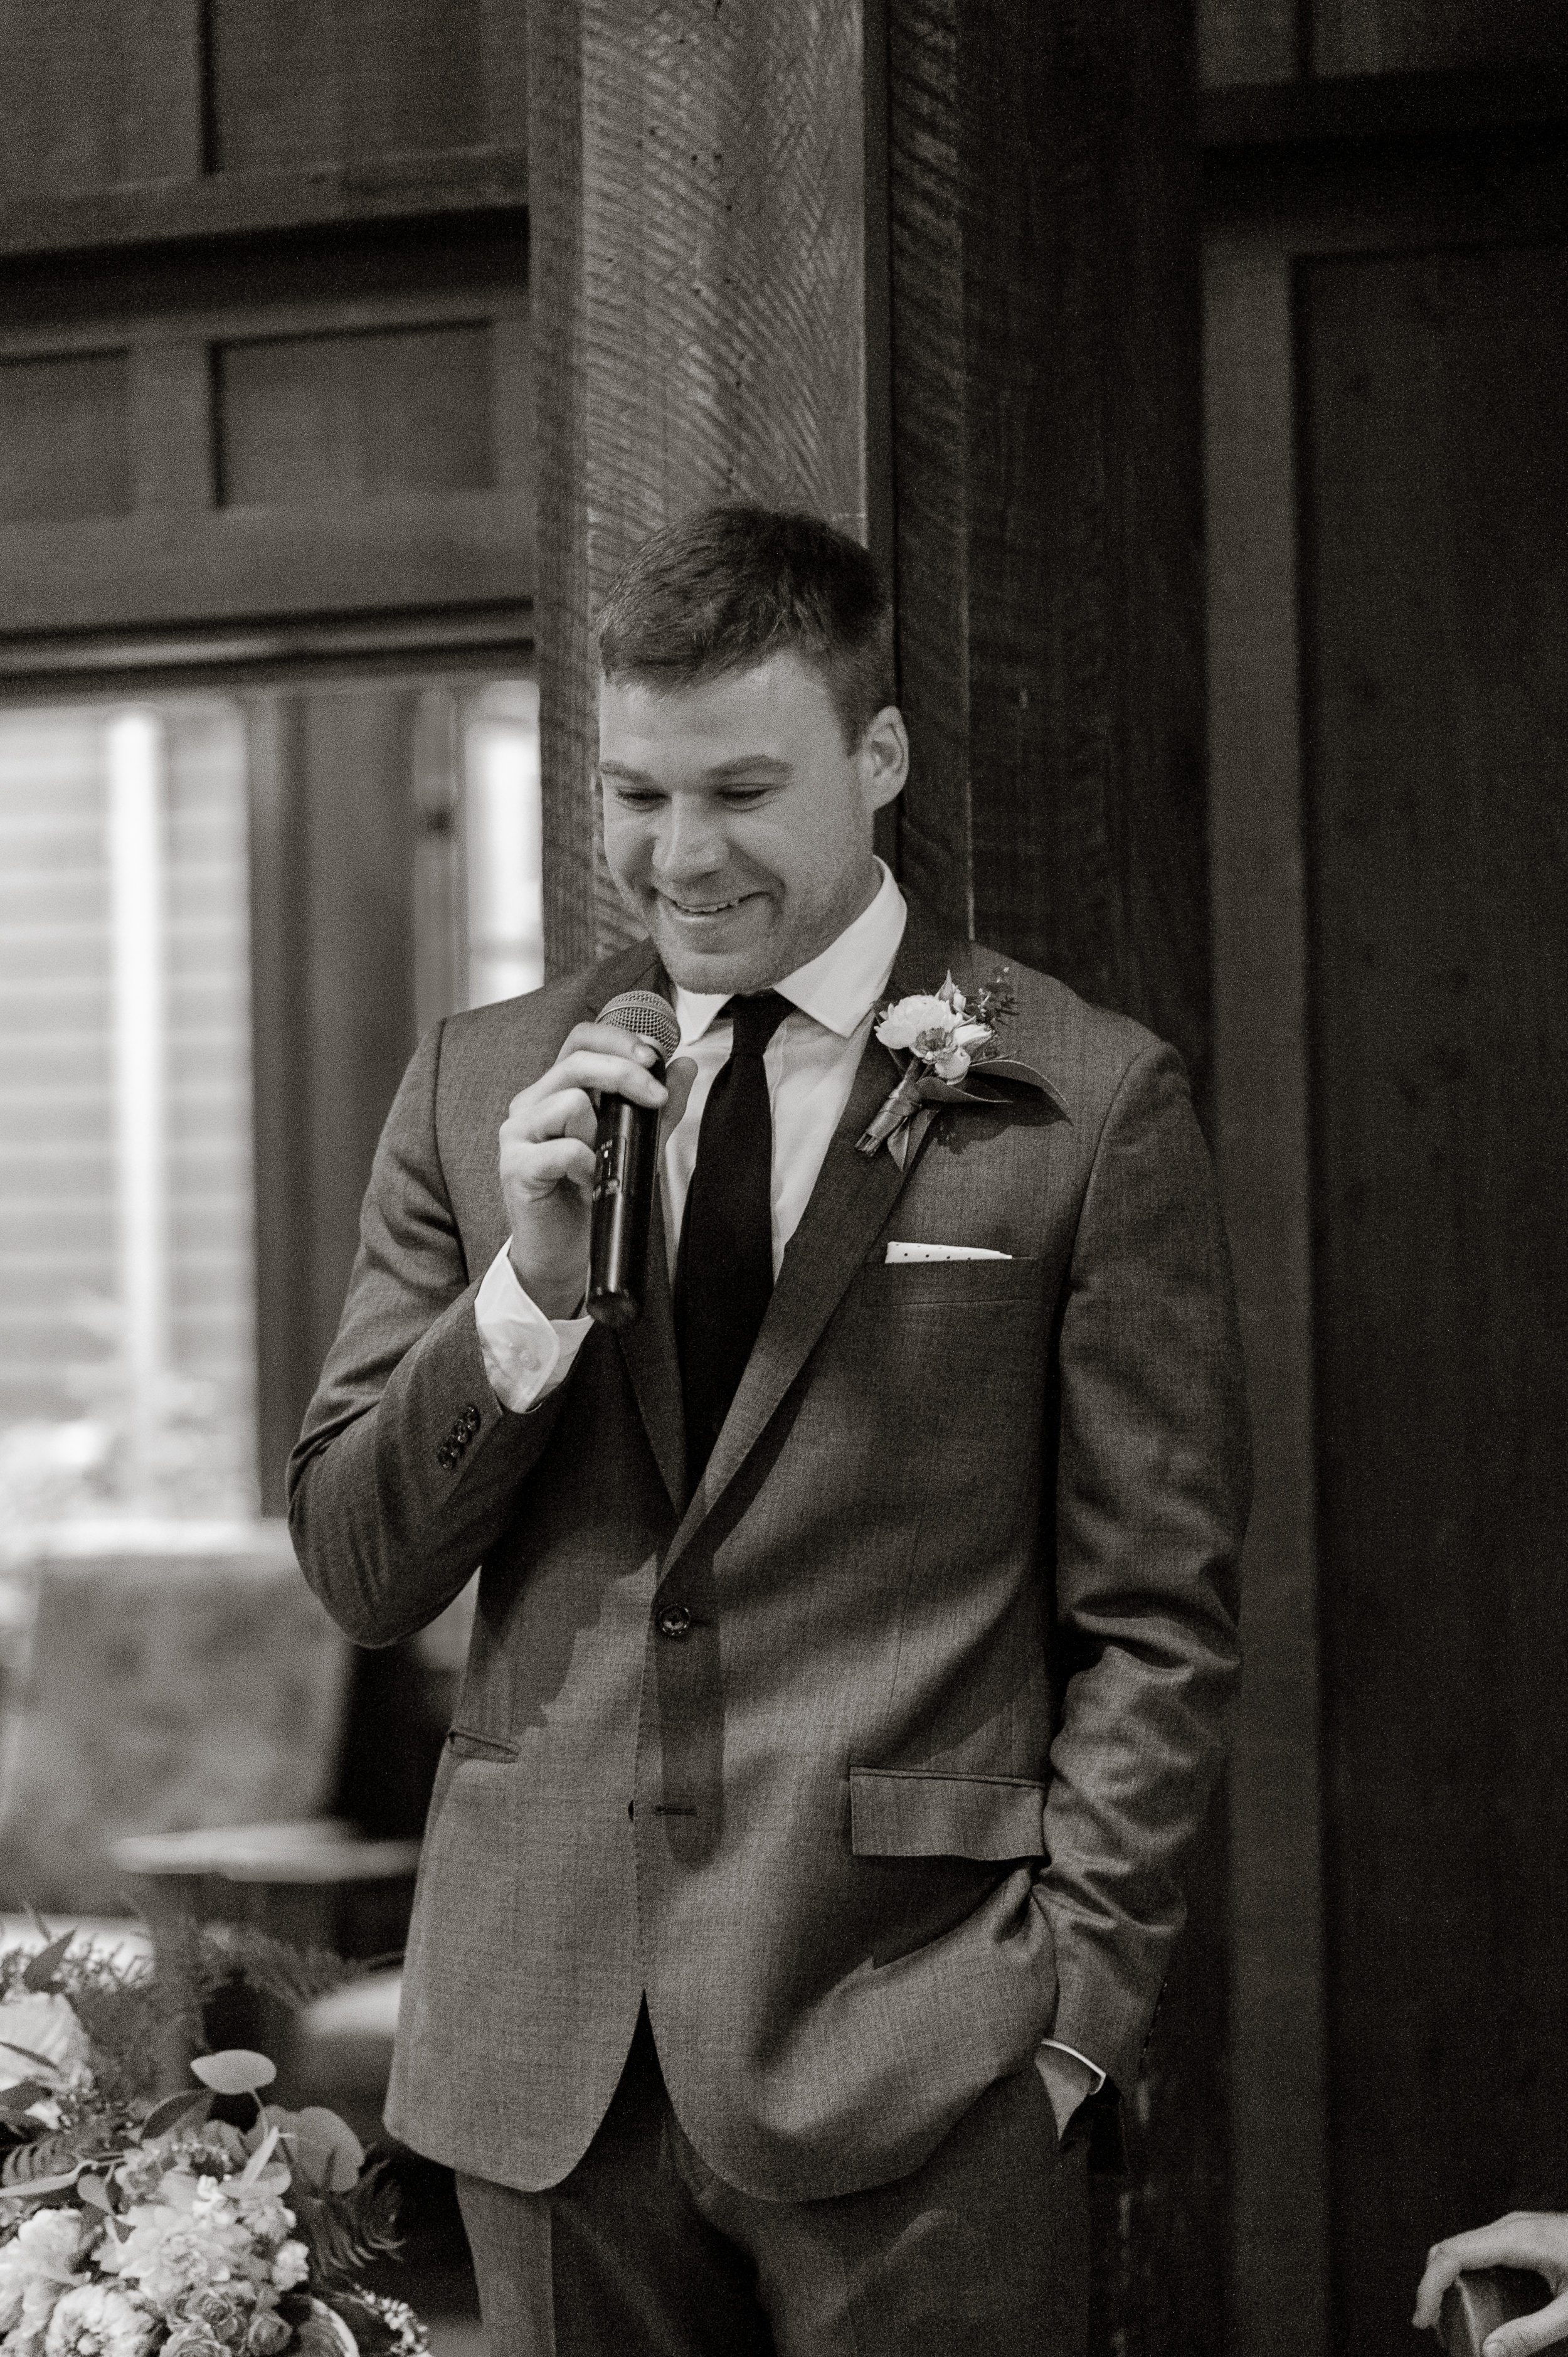 faculty-club-berkeley-wedding-photographer-vc070.jpg